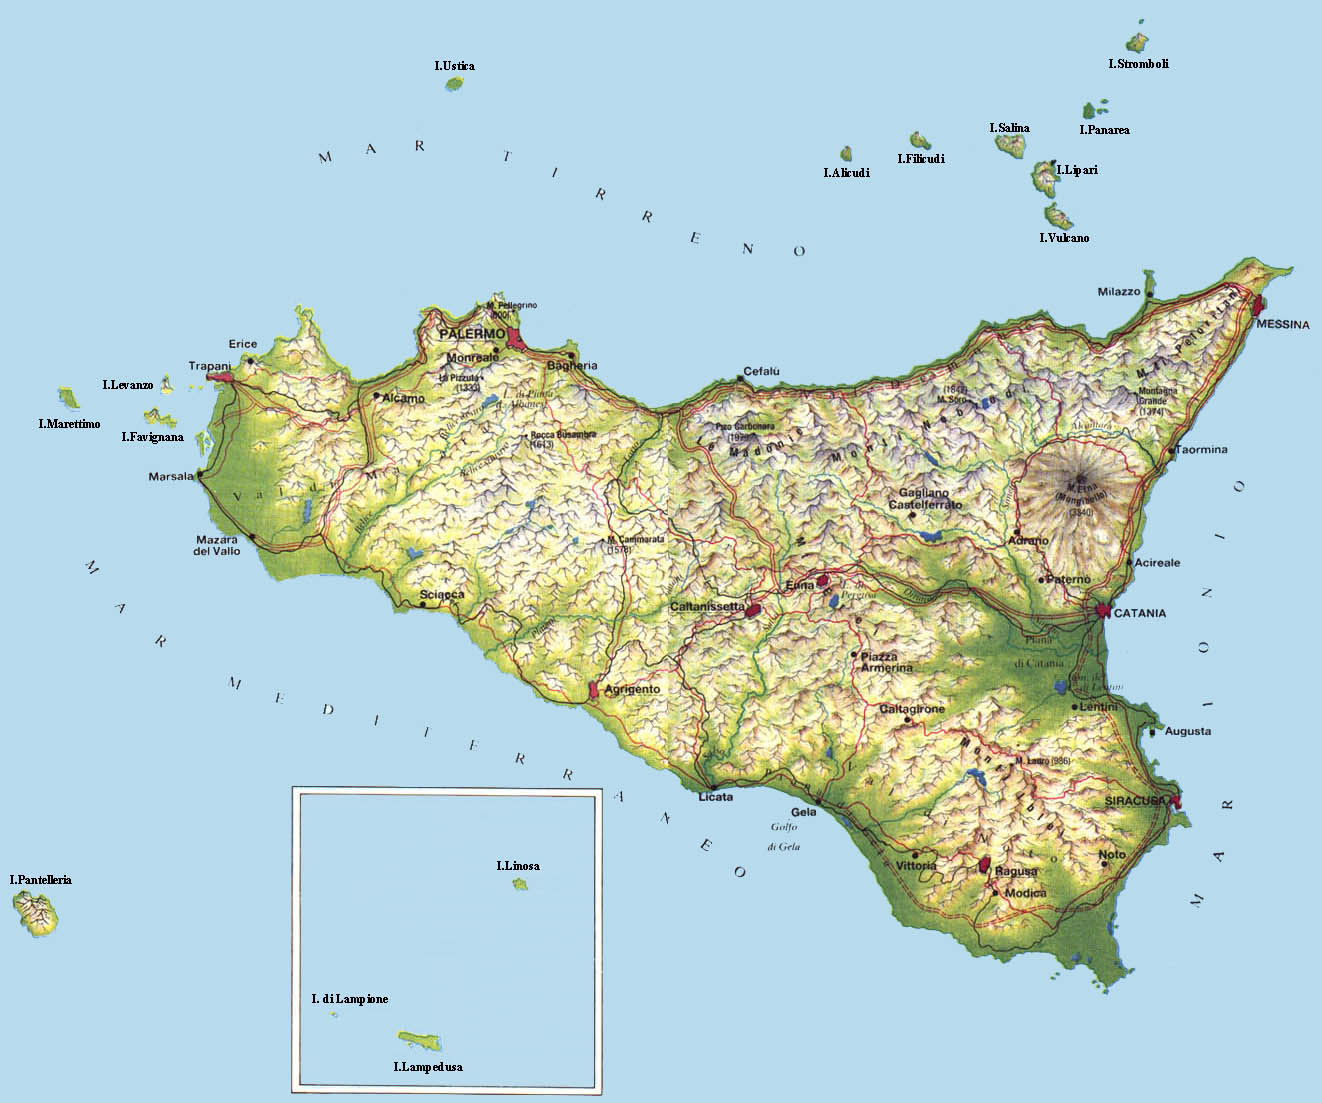 Sicilia Fisica Cartina.Sicilia Fisica Milanonera